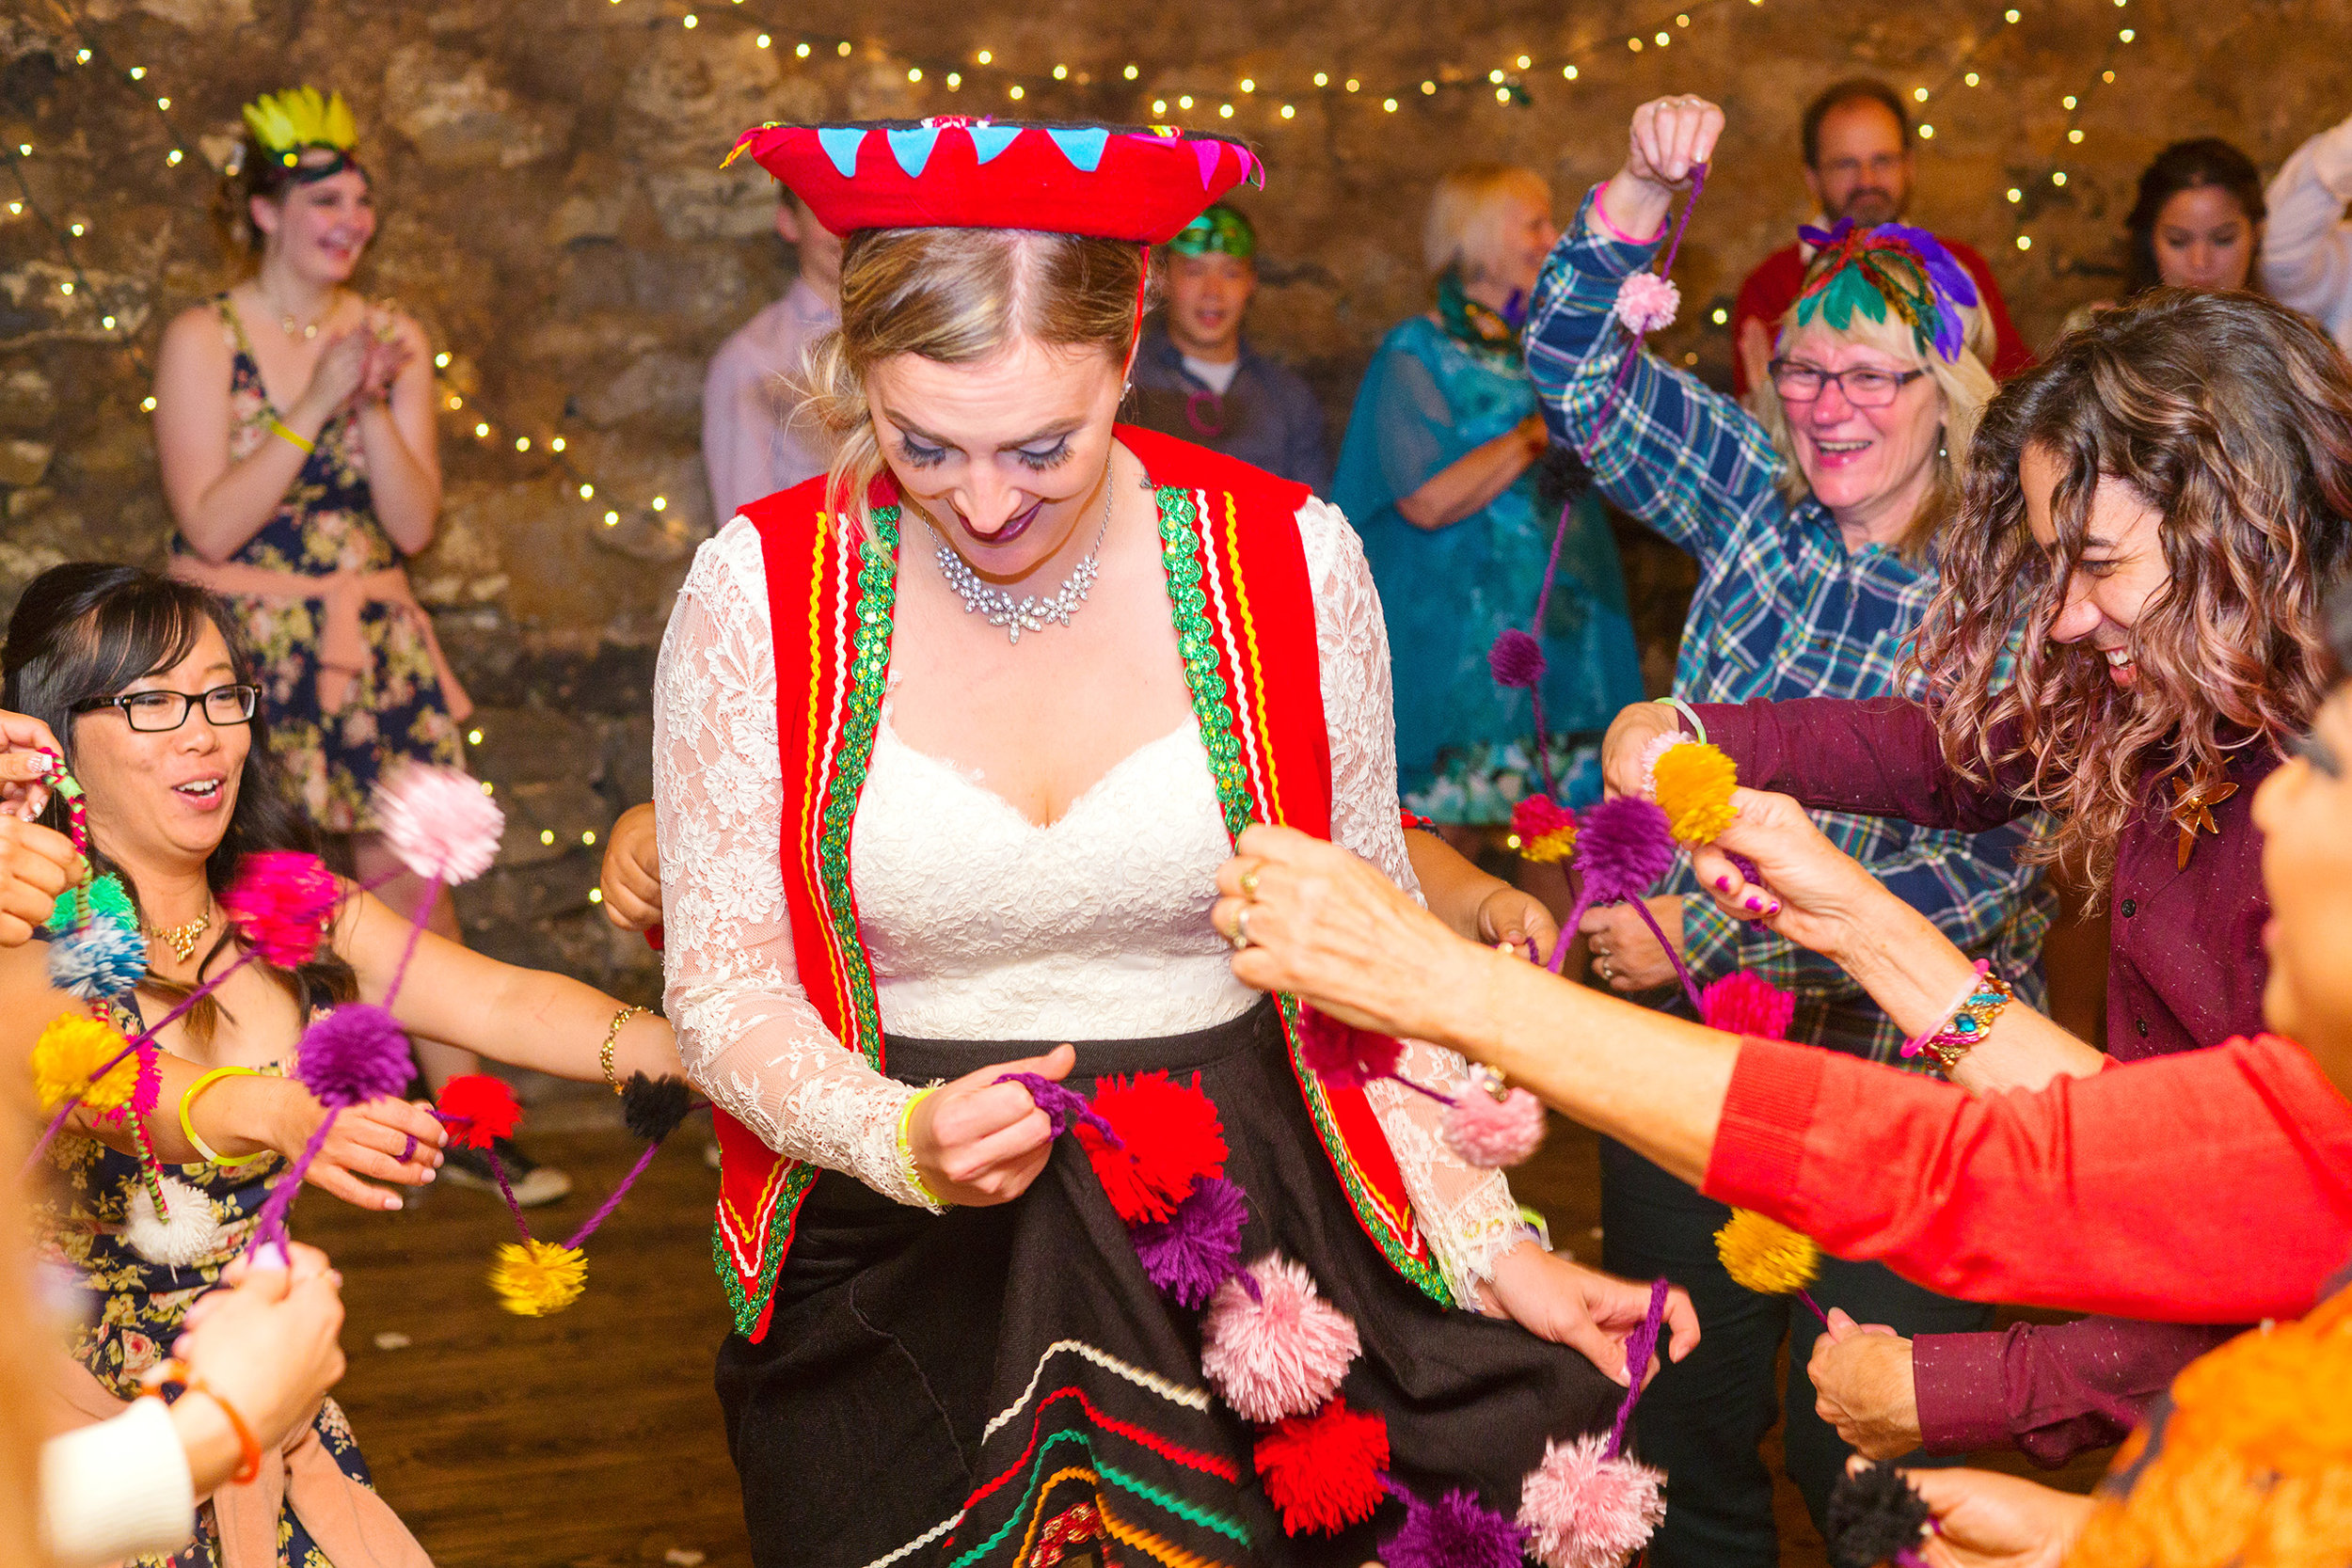 hora loca wedding photography in maryland and virginia